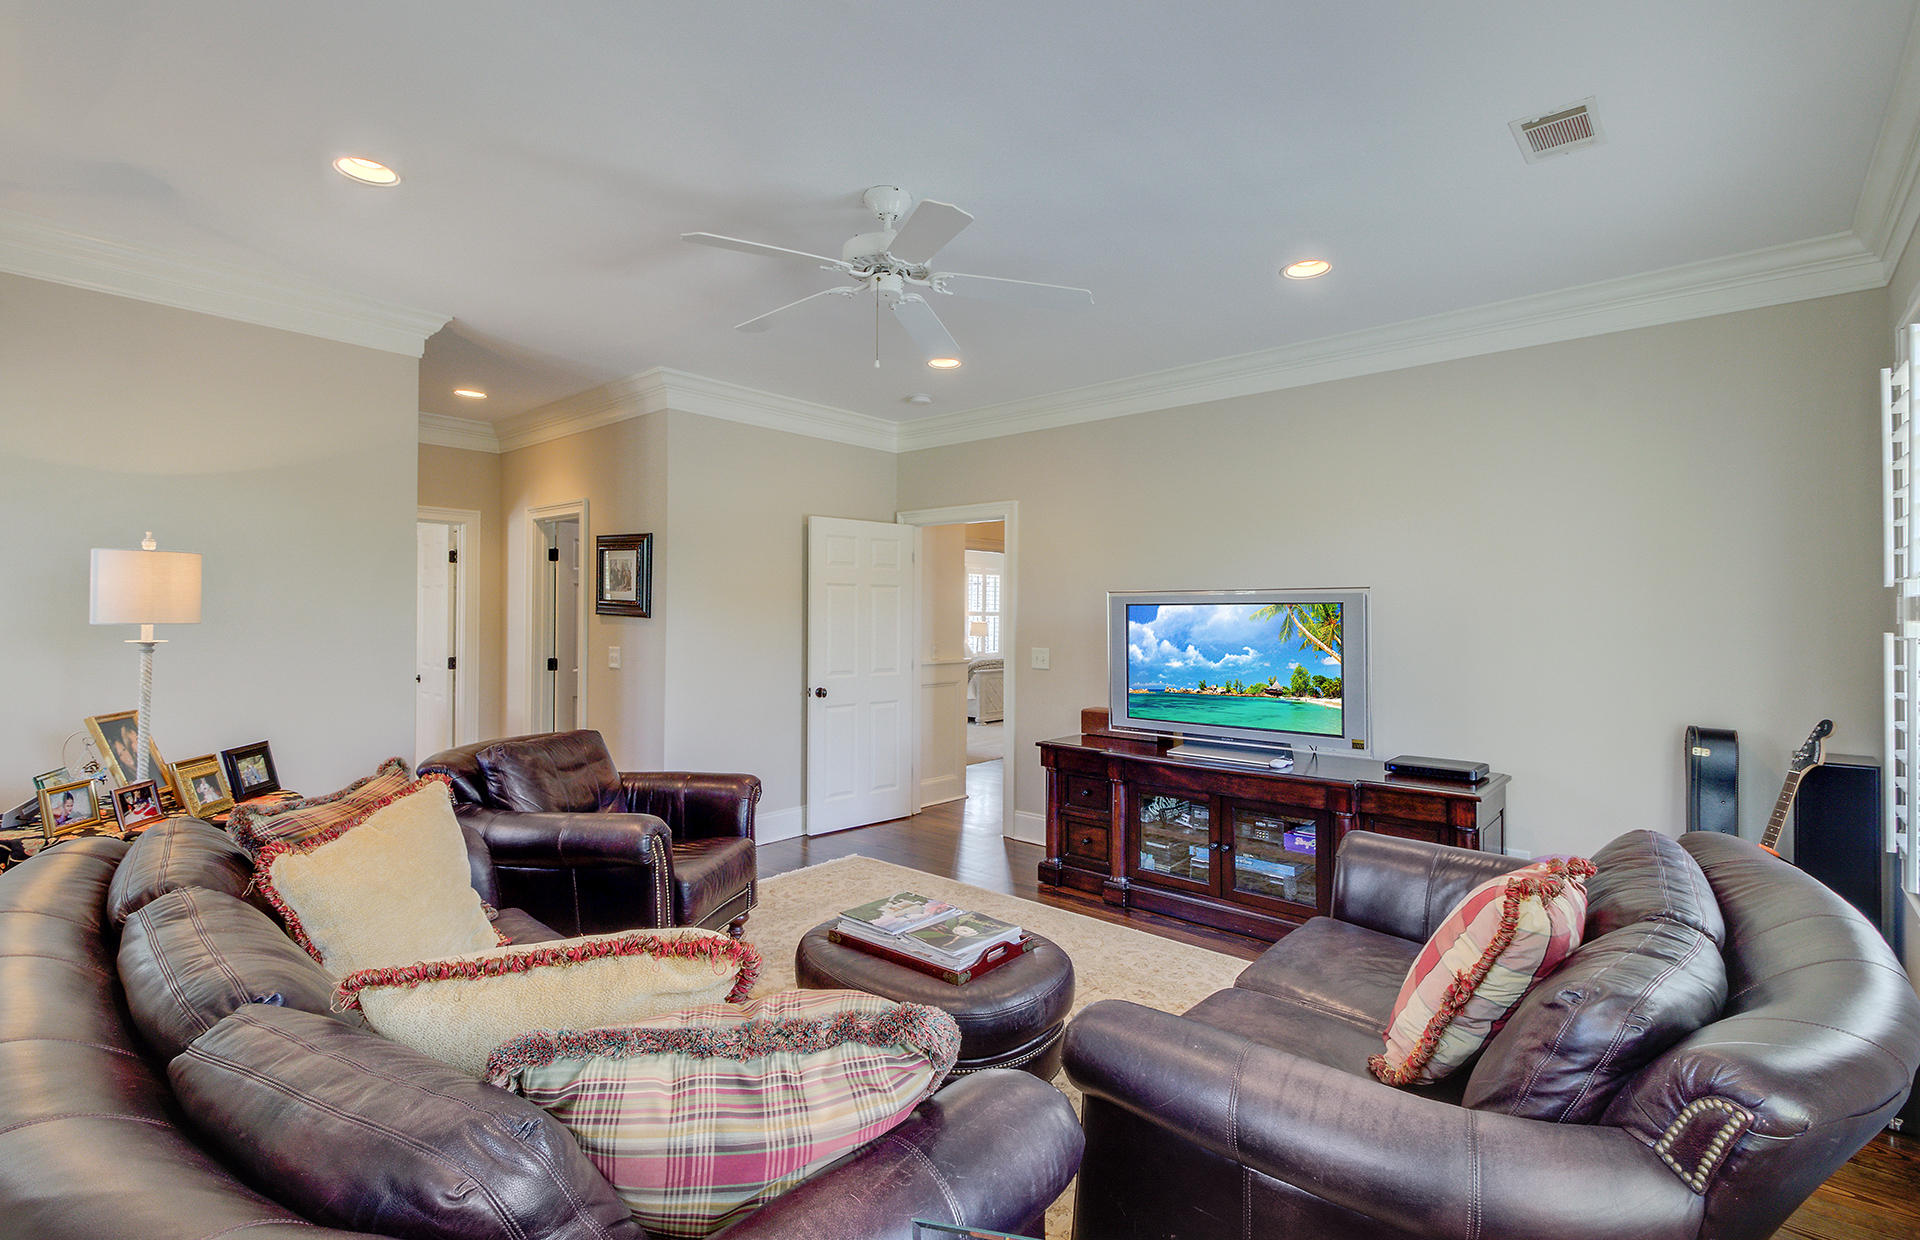 Olde Park Homes For Sale - 770 Olde Central, Mount Pleasant, SC - 85